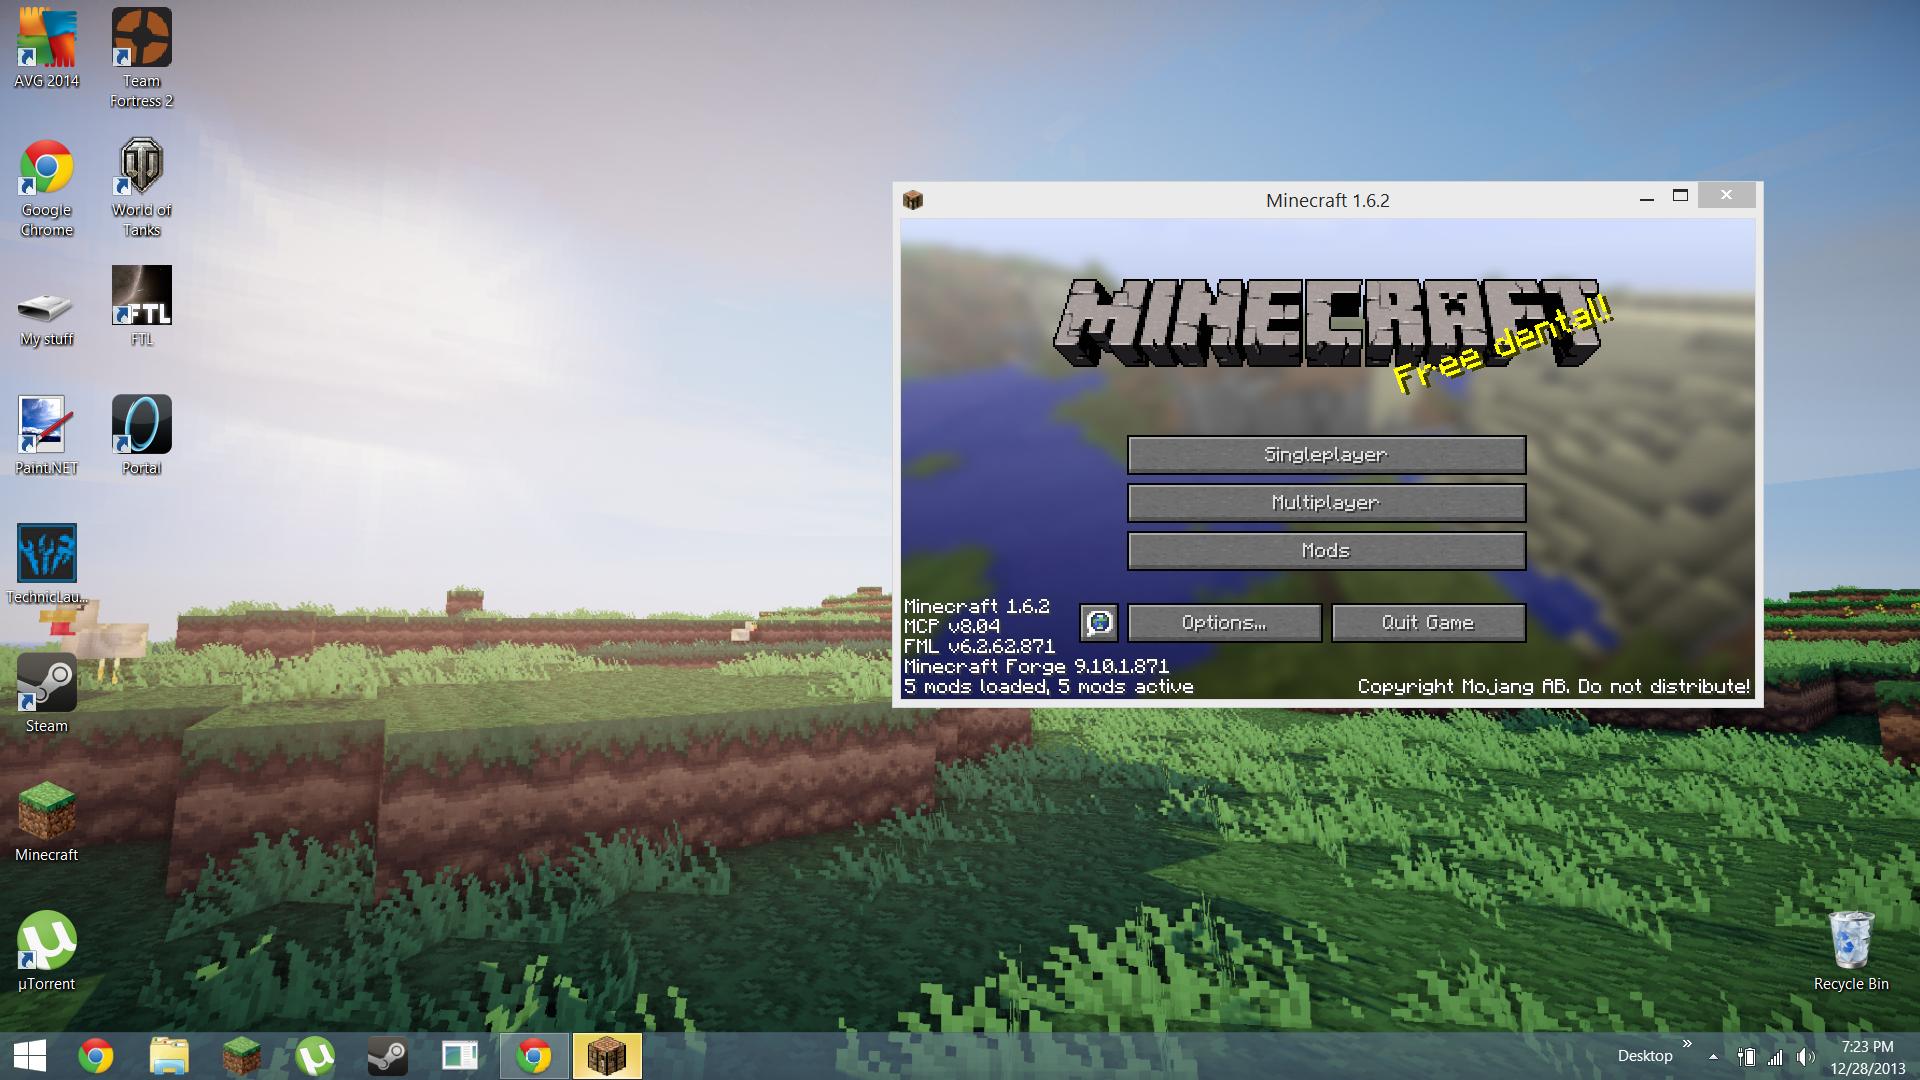 45+] Minecraft Windows 10 Wallpapers Download on WallpaperSafari